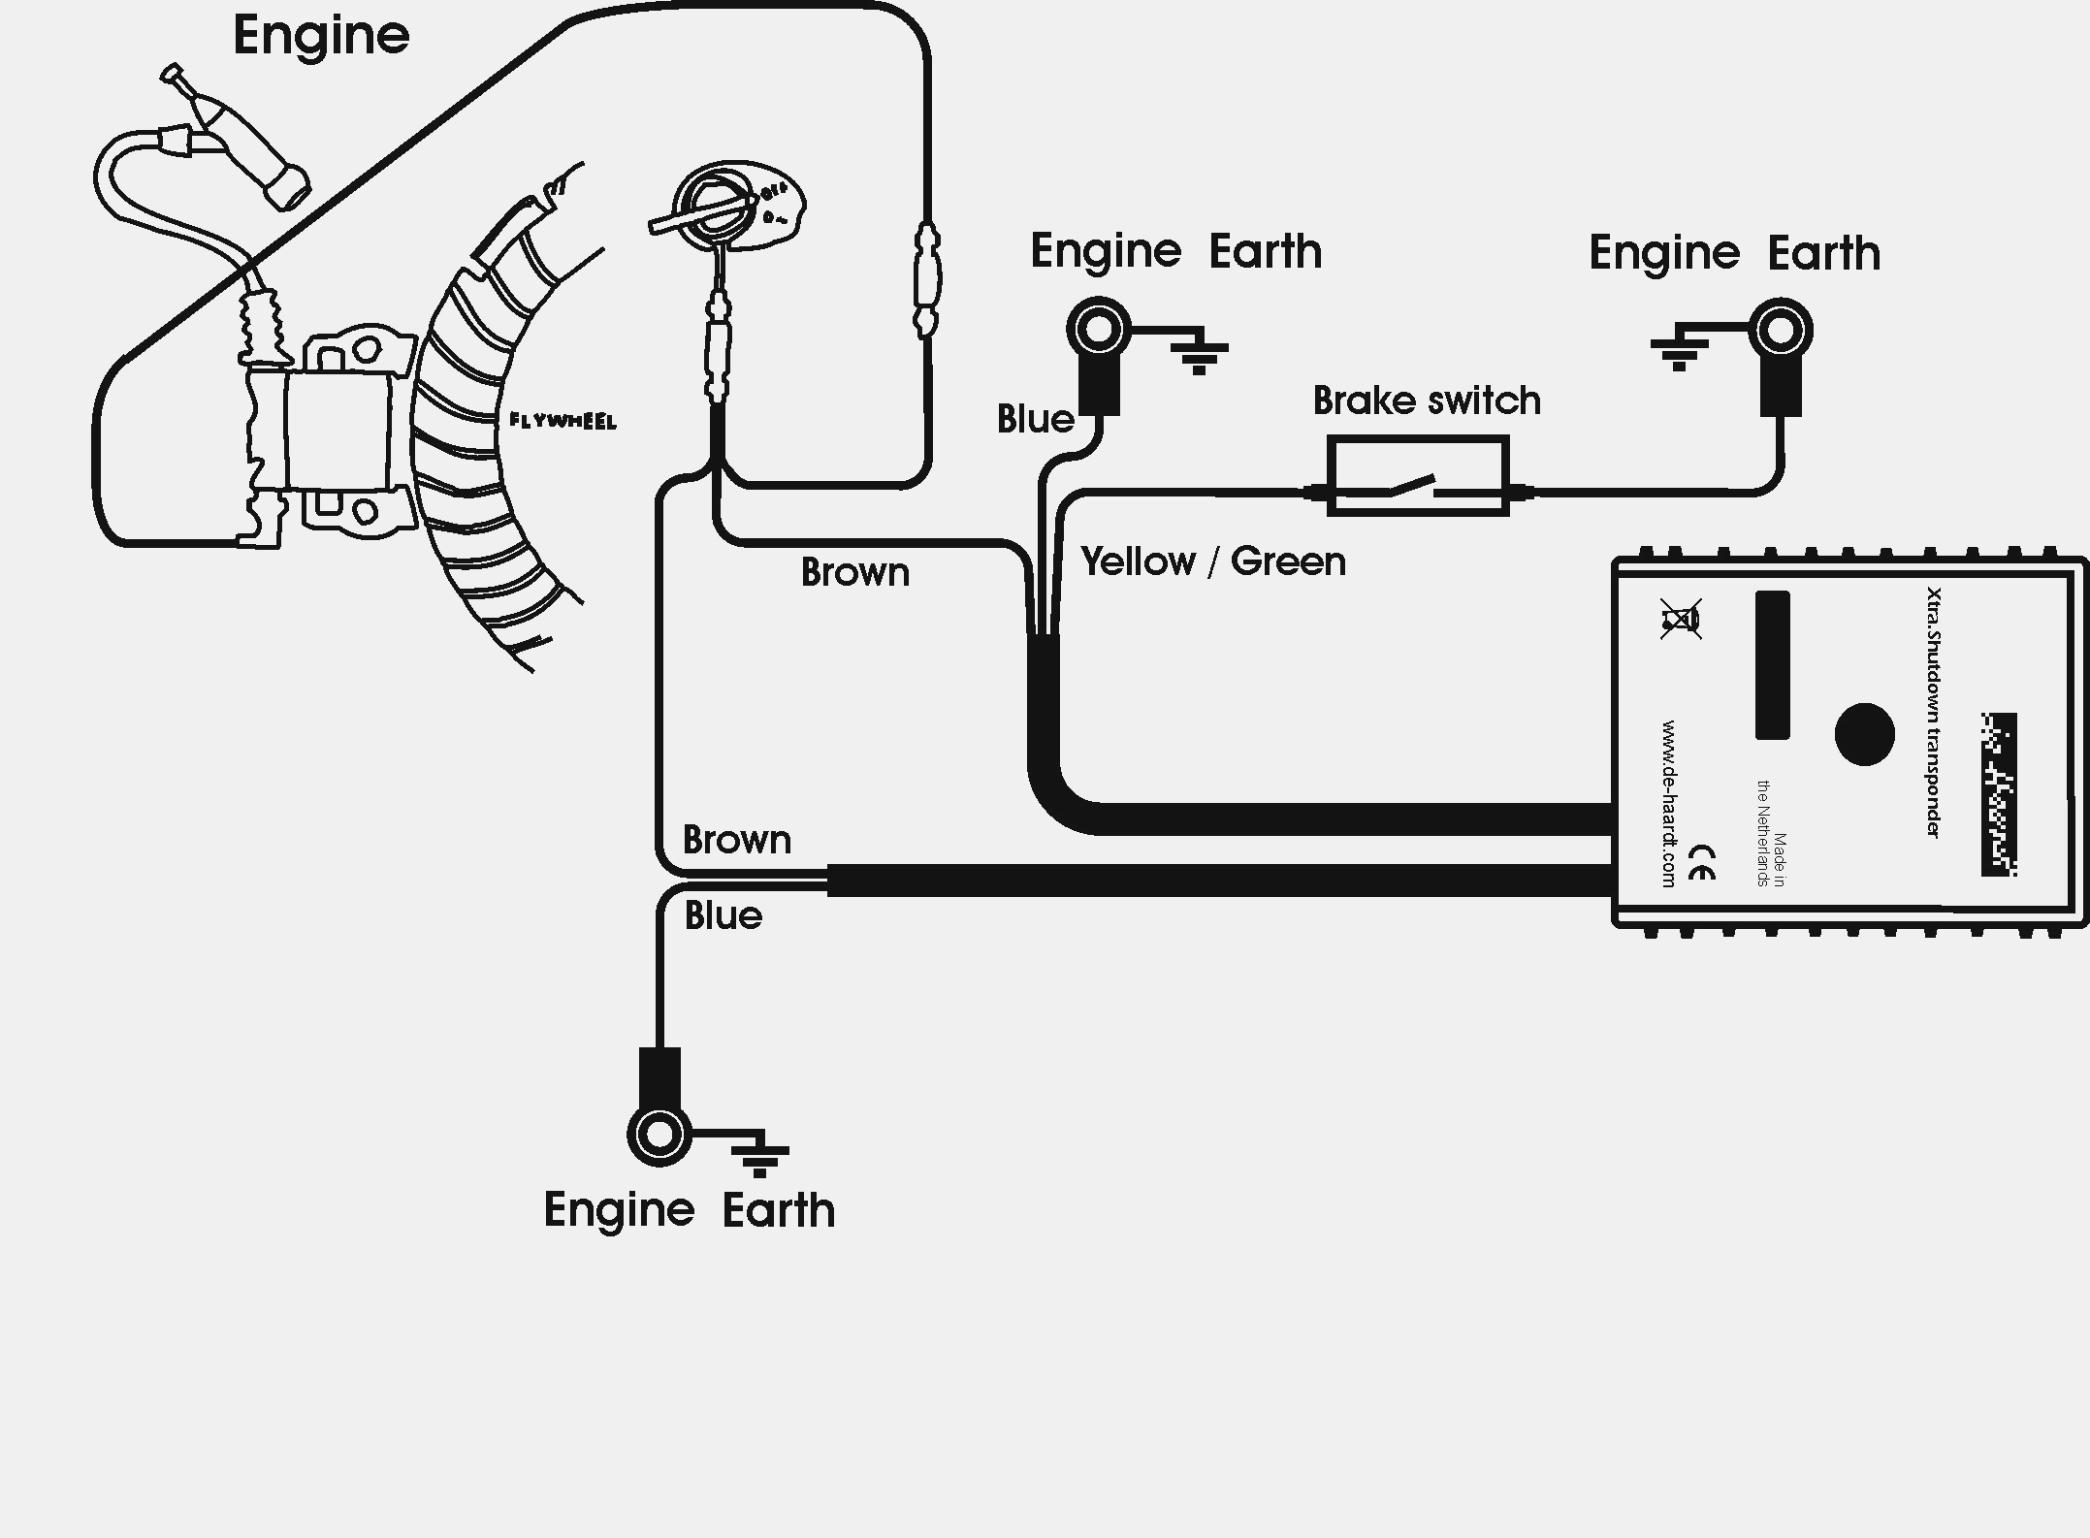 Wiring Diagram For Honda Gx390 Engine | Wiring Diagram - Honda Gx390 Wiring Diagram